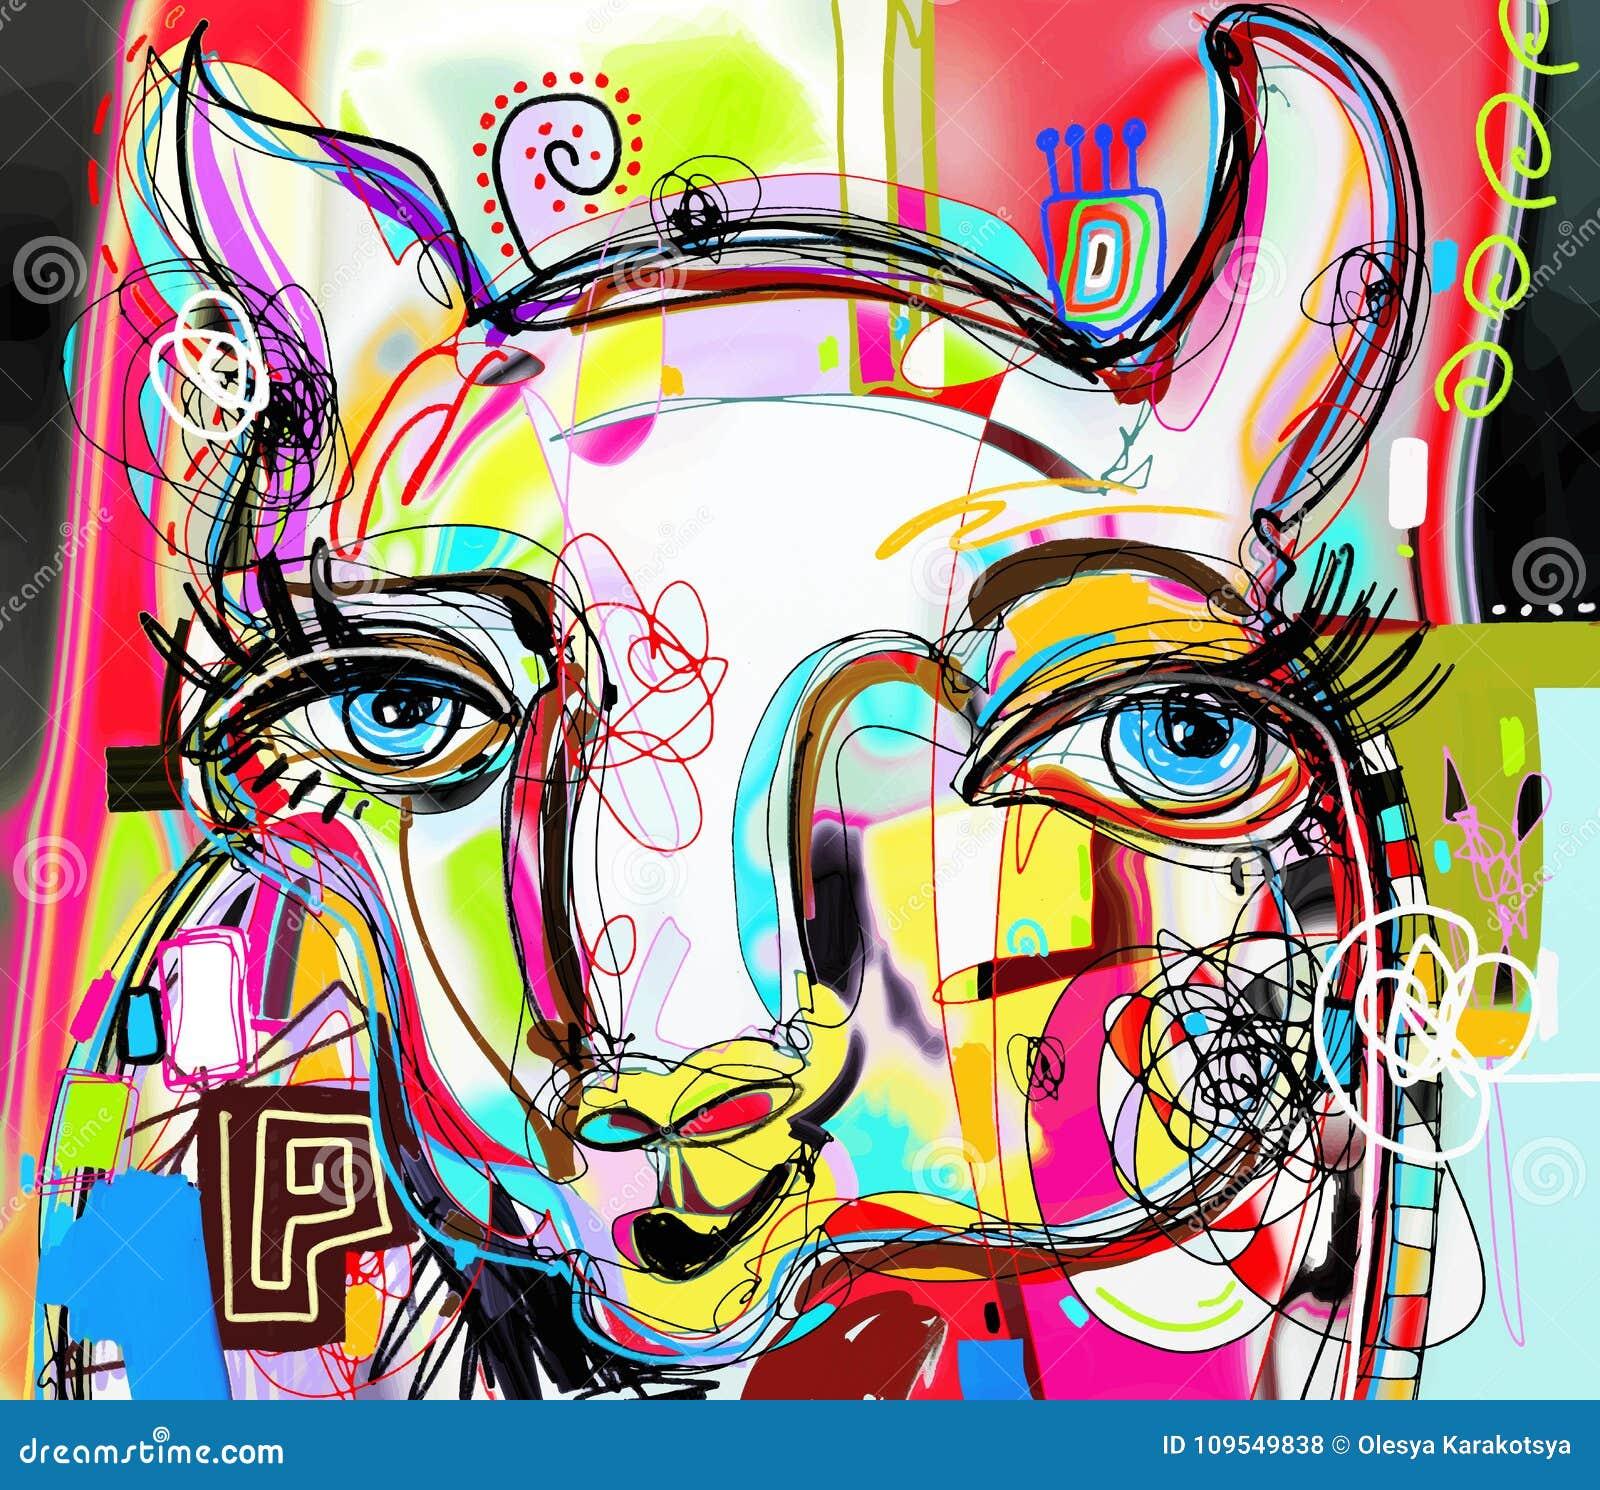 Unique Abstract Digital Art Painting Of Llama Portrait Stock Vector Illustration Of Creativity Graphic 109549838